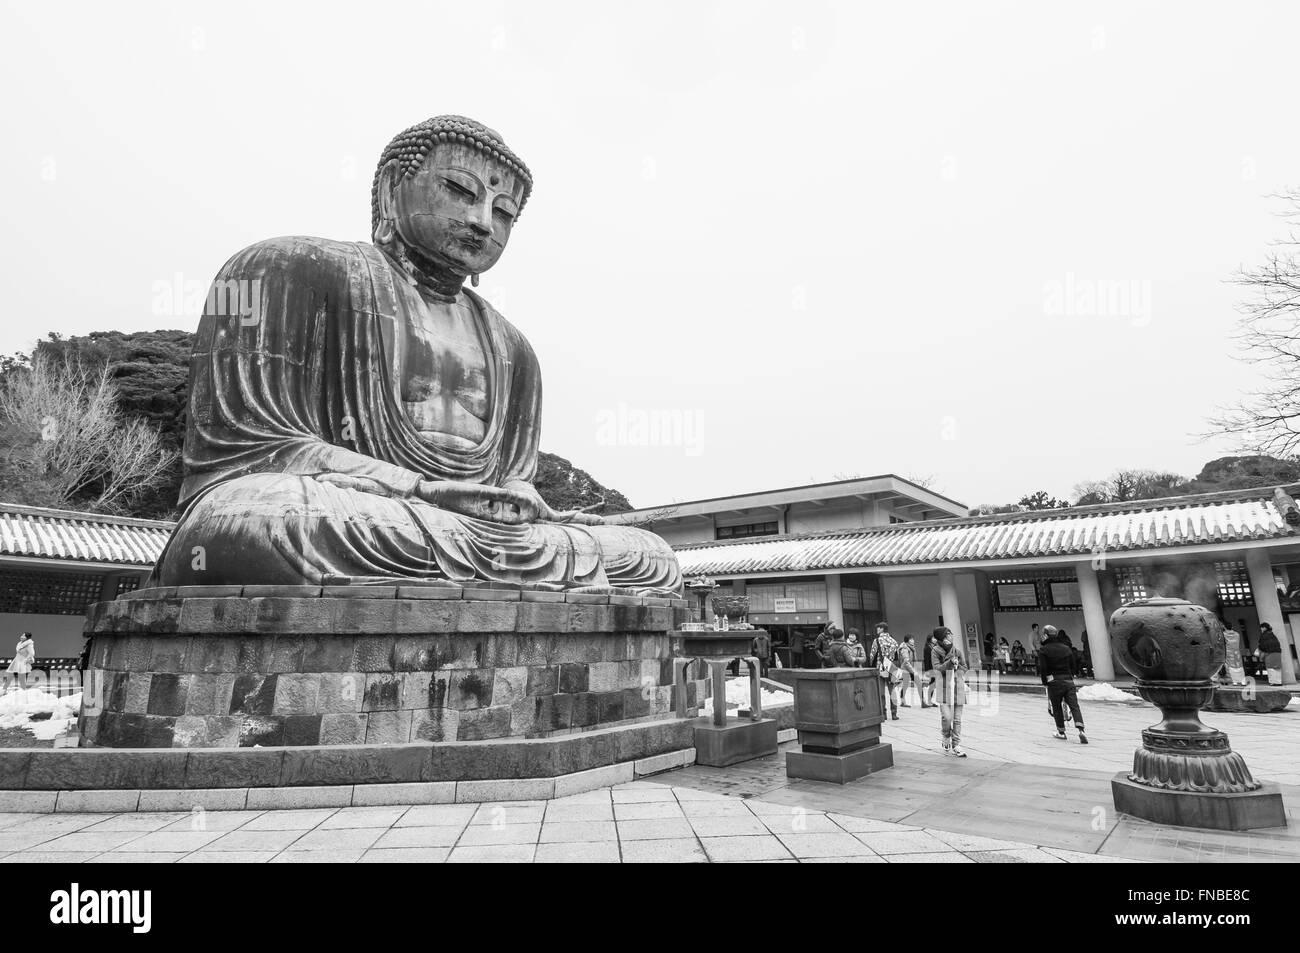 Amida Buddha, Kotoku-in, Buddhist temple, Kamakura, Kanagawa Prefecture, Japan - Stock Image